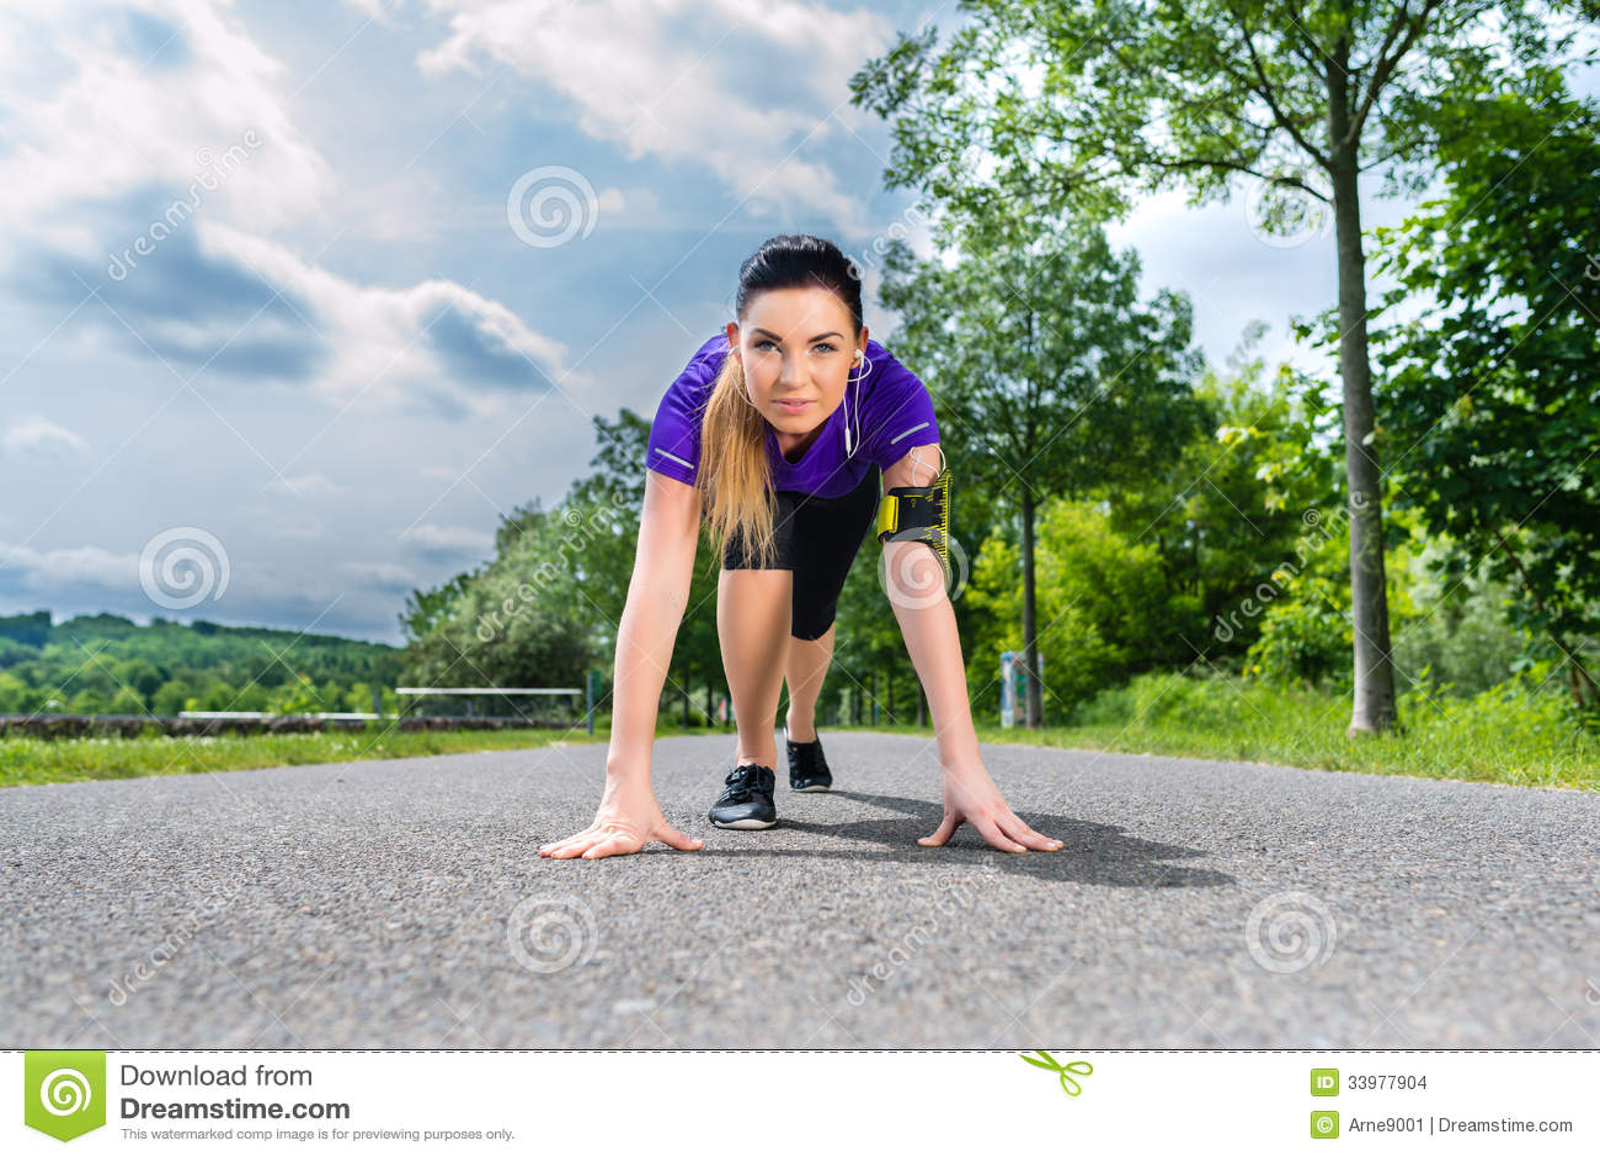 sports trackfield outdoor women